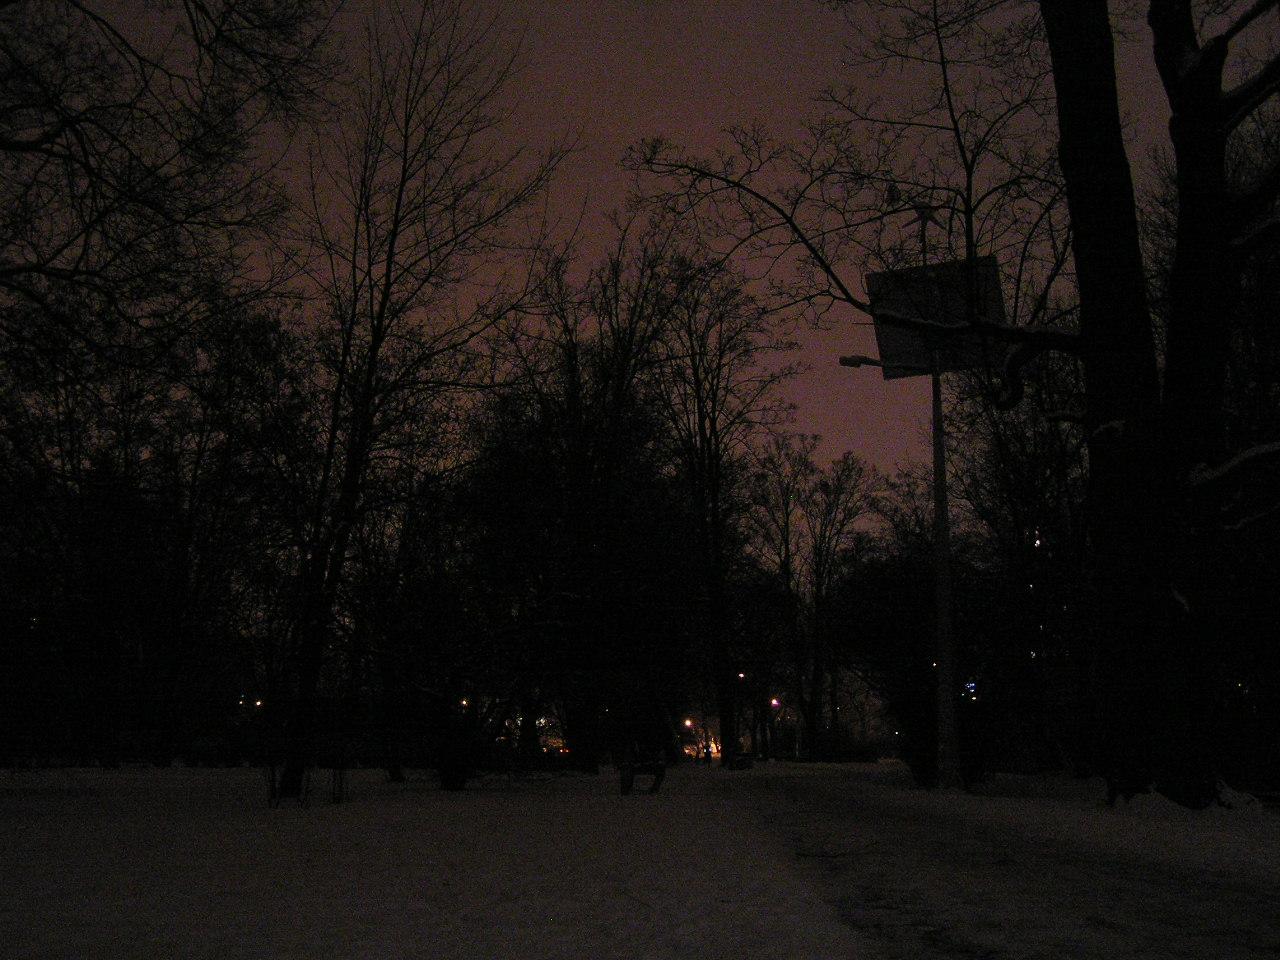 Ciemności wróciły do Parku